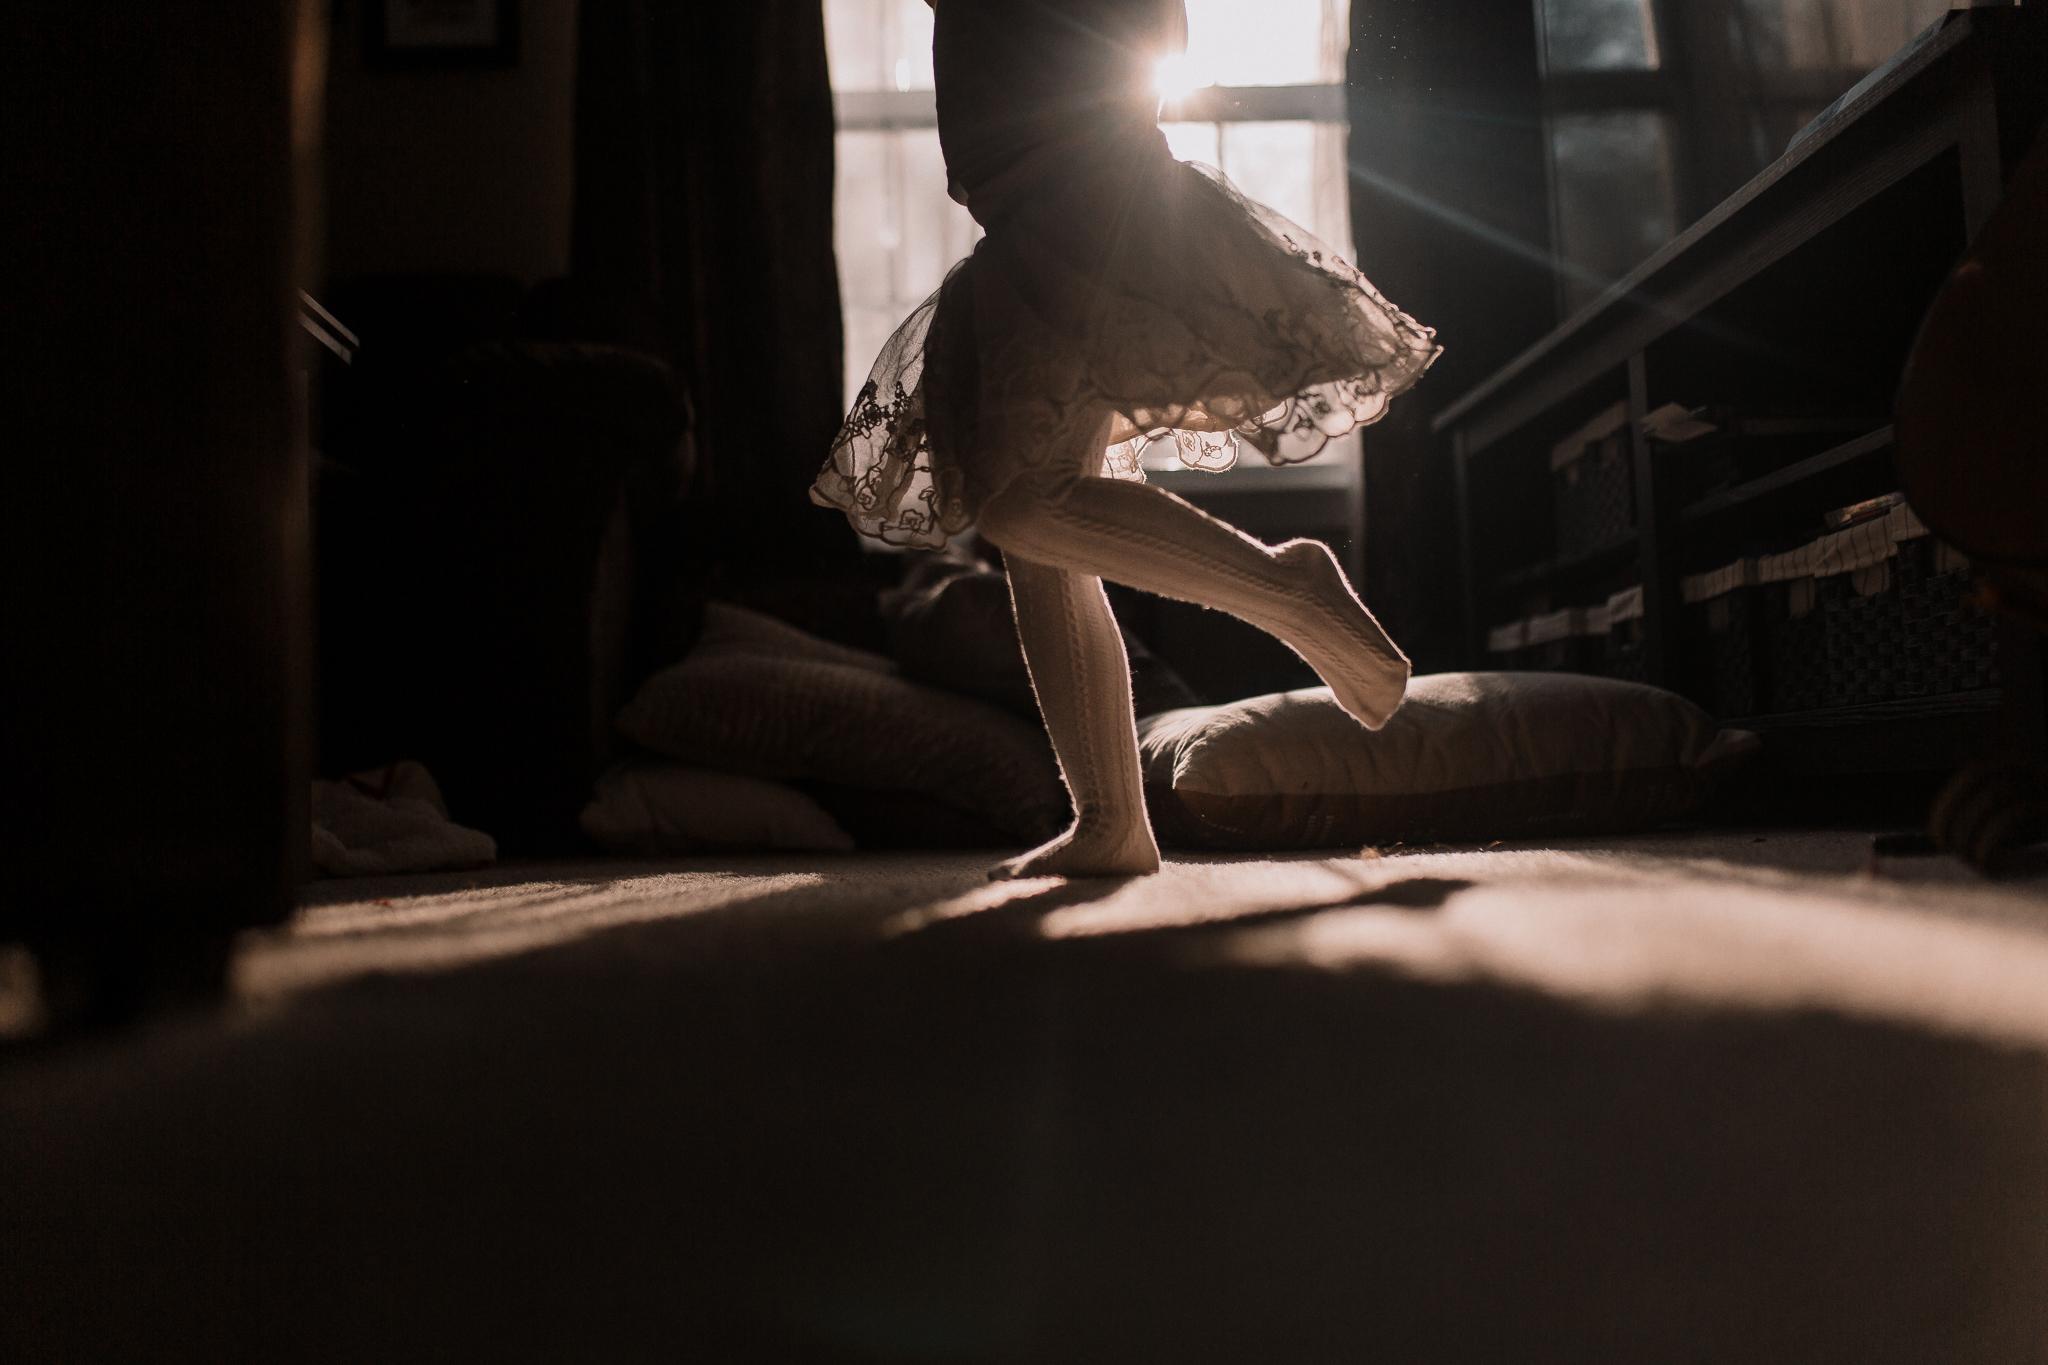 girl twirl skirt movement light starburst childhood lifestyle documentary Ashburn Virginia Marti Austin Photography